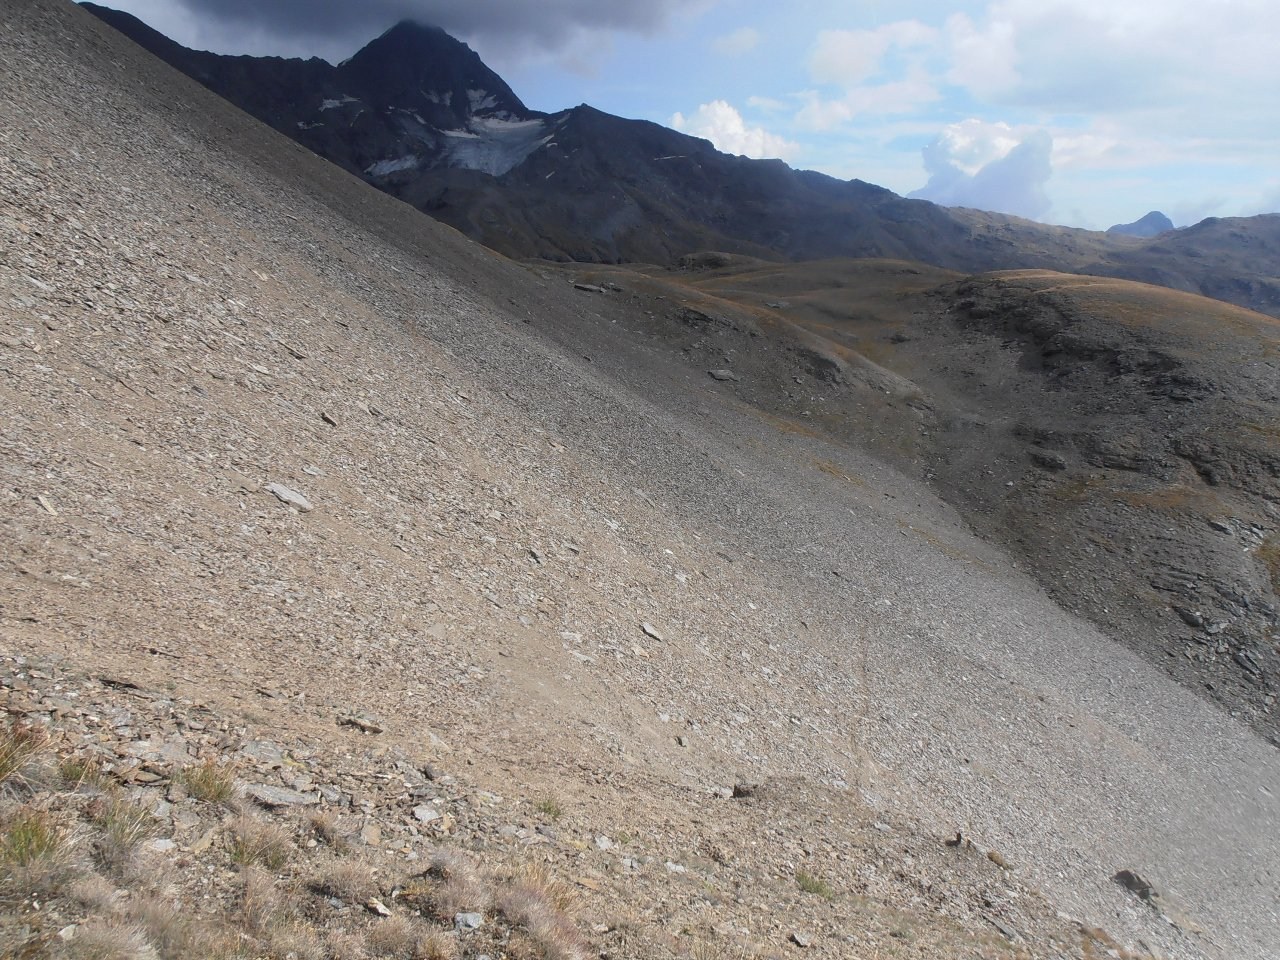 04 - infide pietraie per risalire alla Punta Gianni Vert